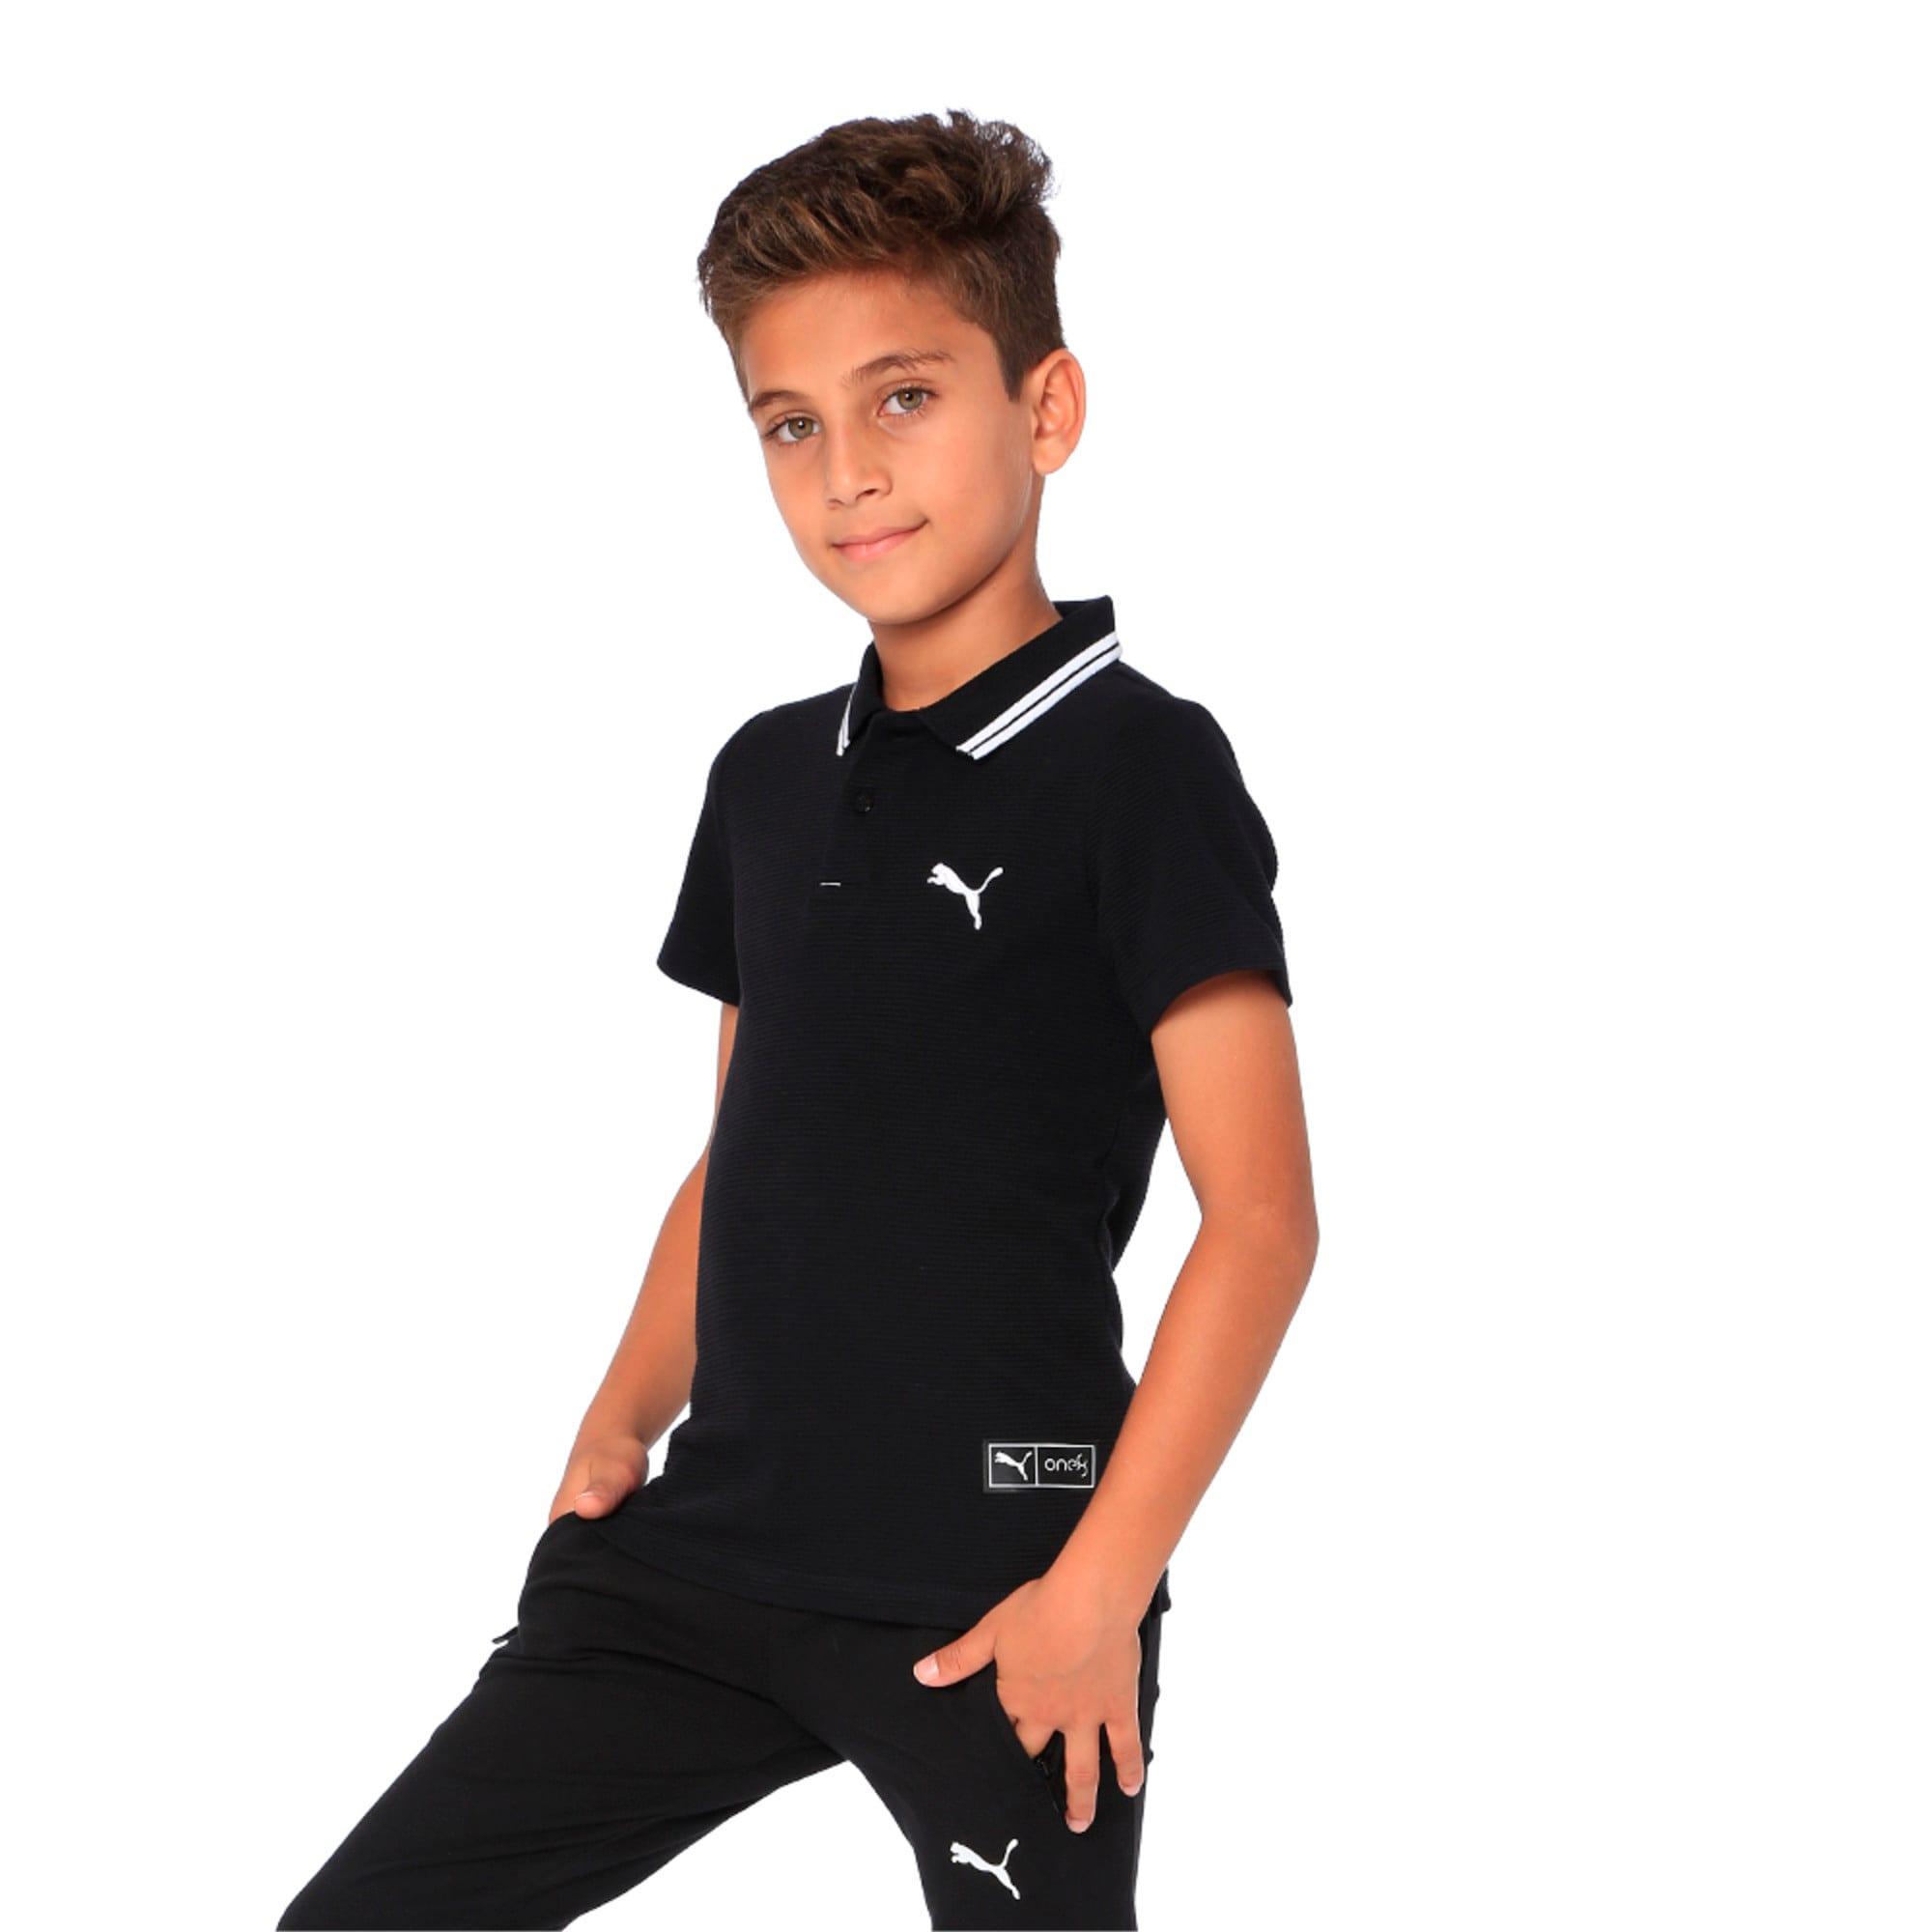 Thumbnail 4 of one8 VK Kids' Stylized Polo, Puma Black, medium-IND